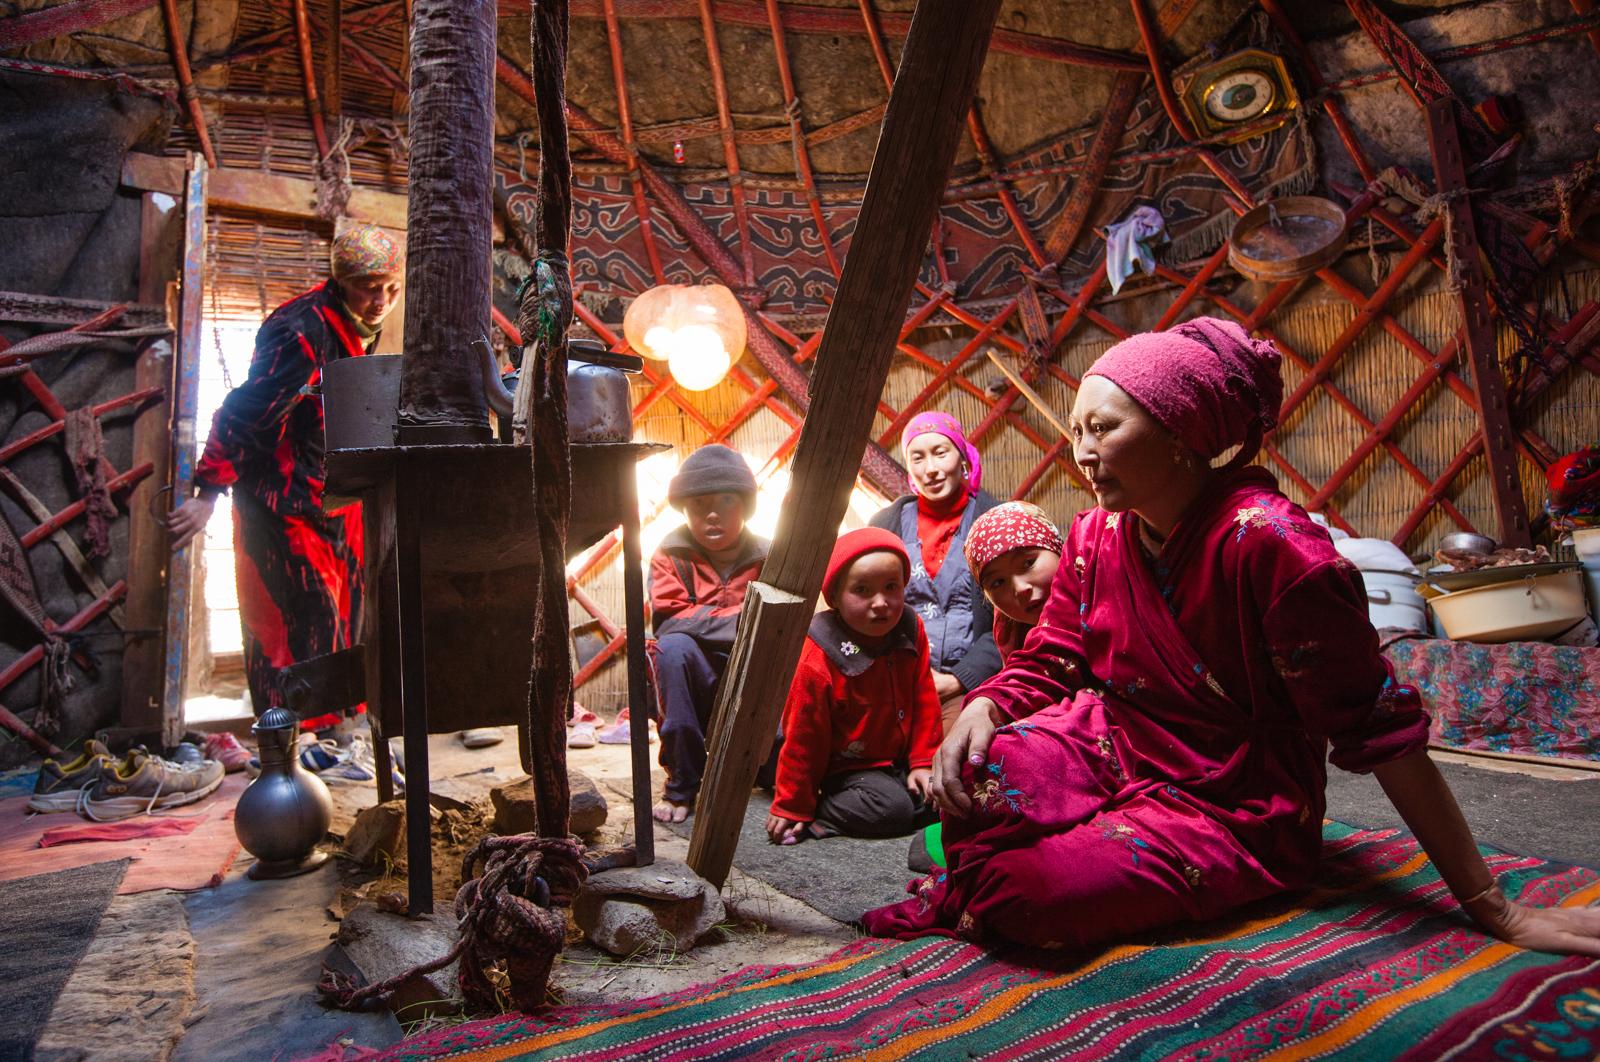 A Kyrgyz yurt in eastern Tajikistan. Credit: Andy Isaacson